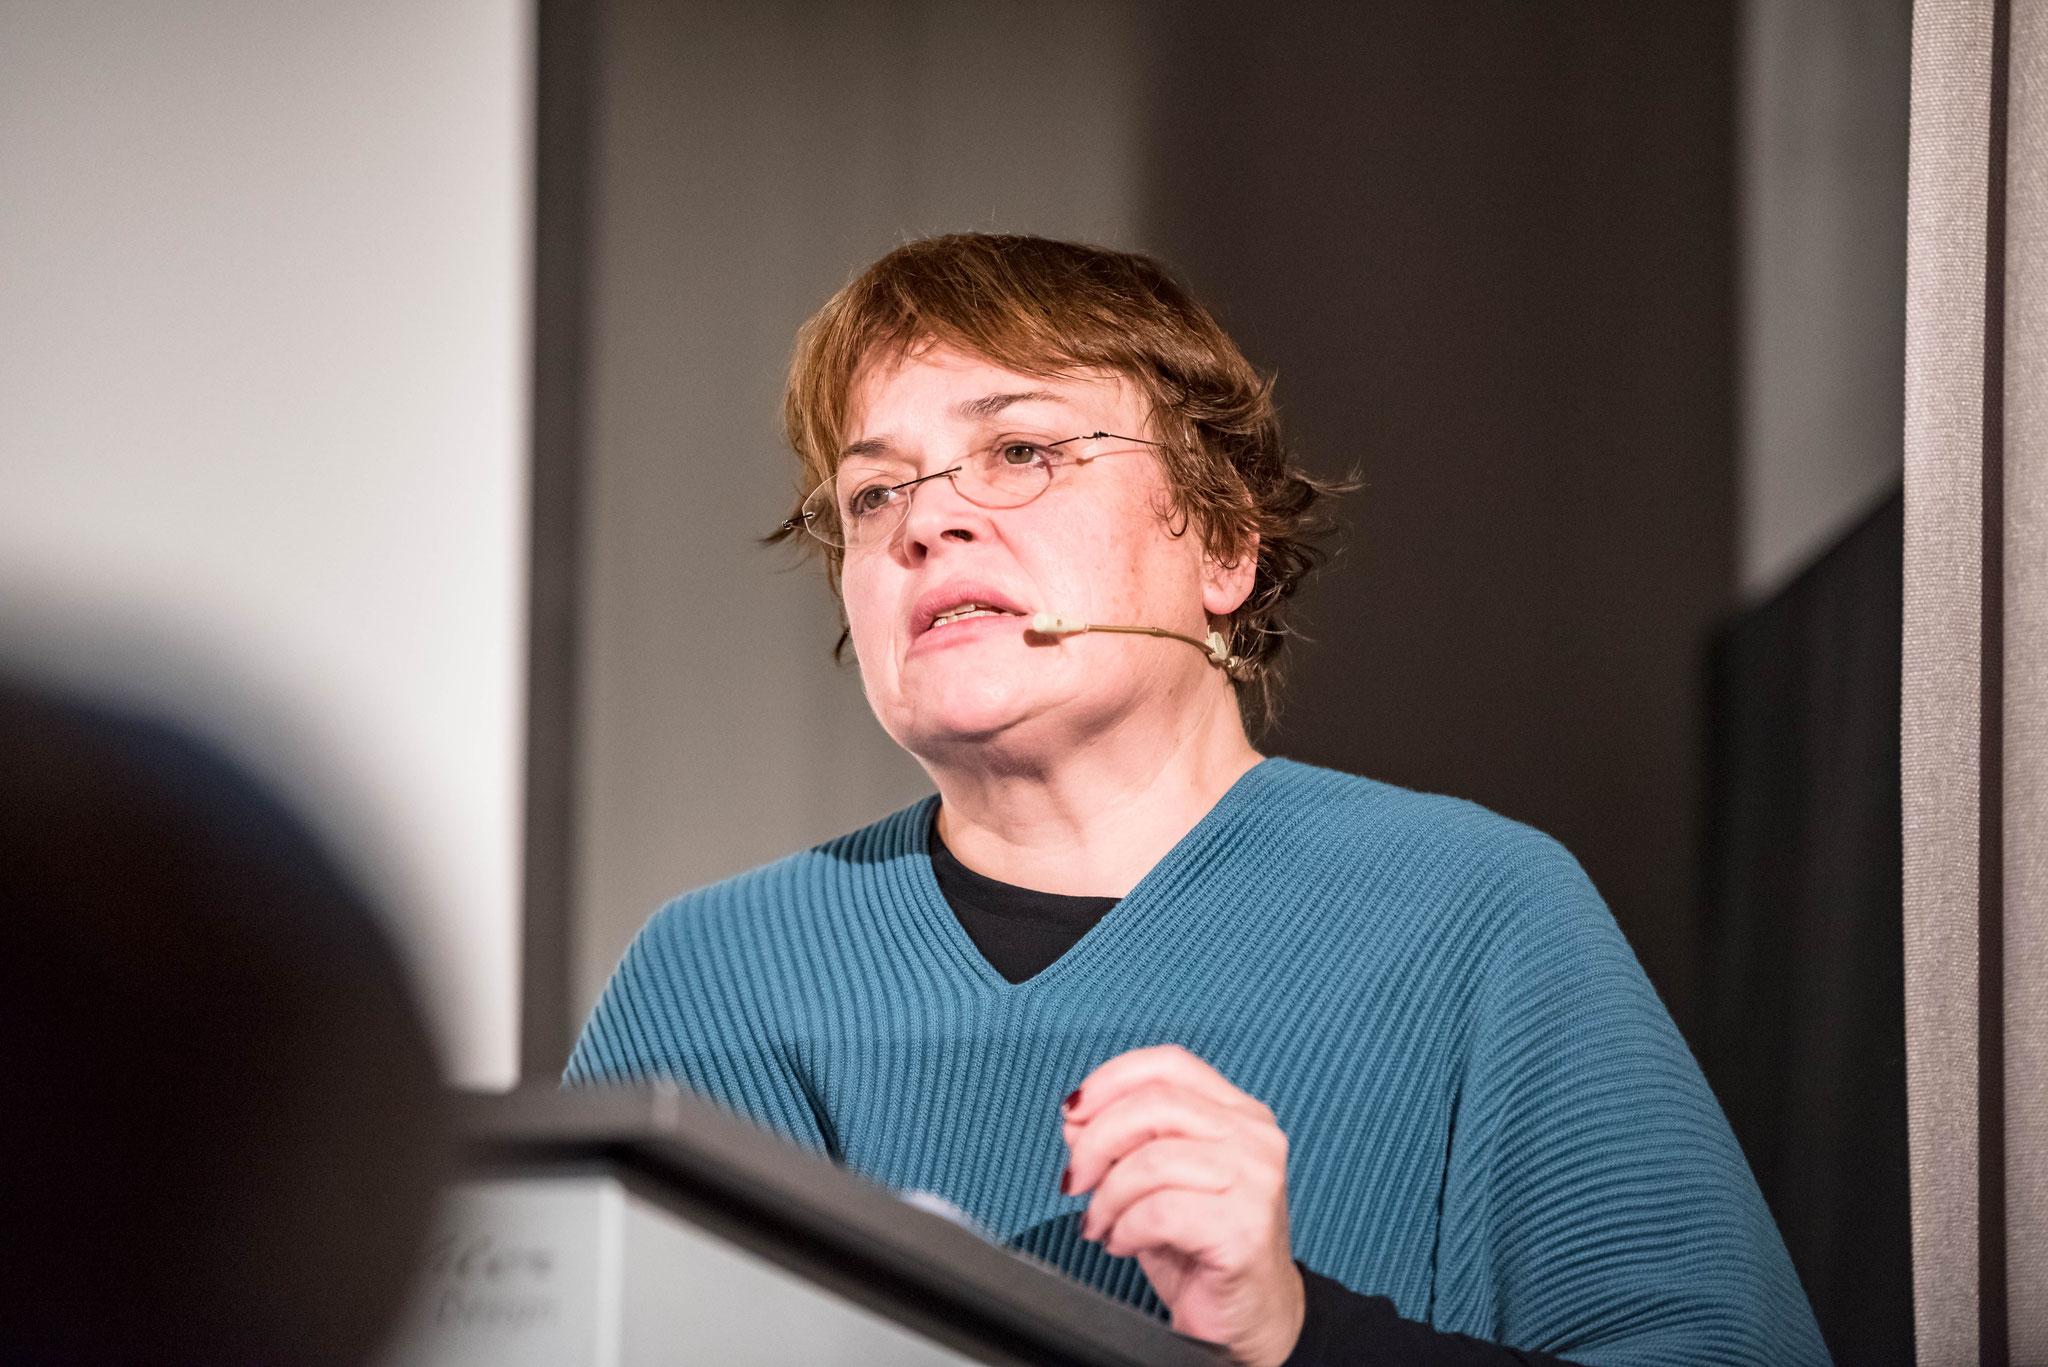 Prof. Dr. Angela Berlis (Dekanin der Theologischen Fakultät, Universität Bern)